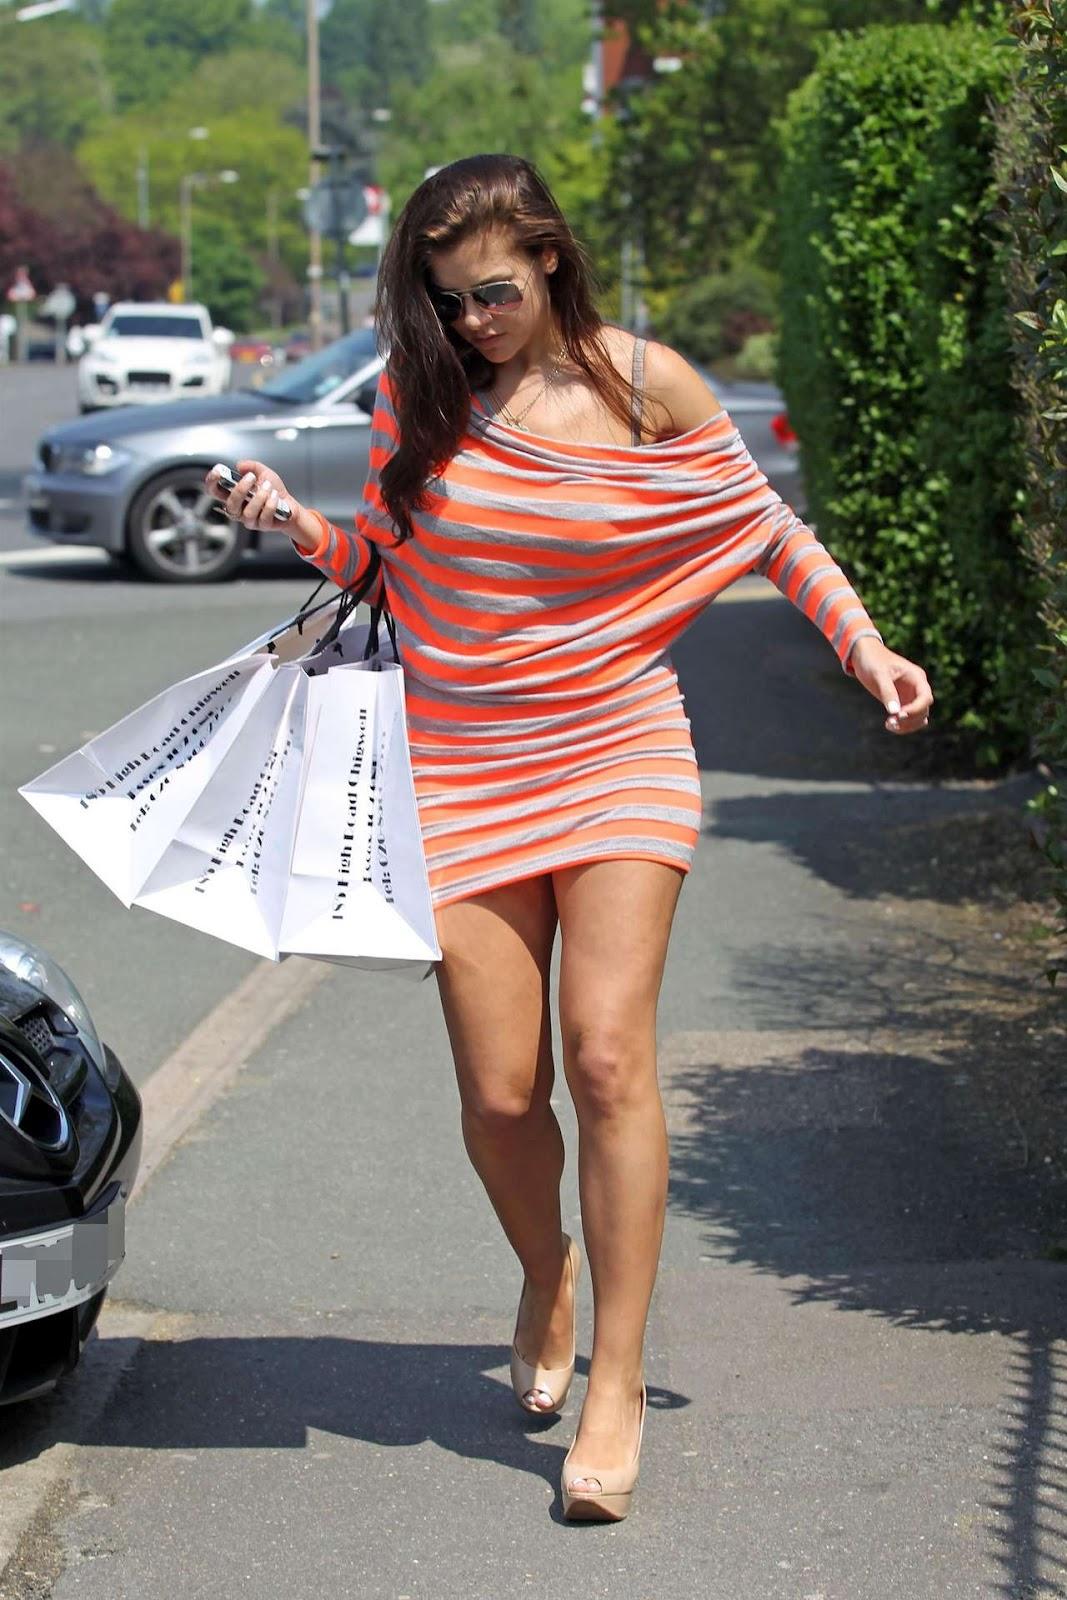 http://1.bp.blogspot.com/-k8GV4INi218/T77kMWhB0-I/AAAAAAAAGQU/cPIa1LYThek/s1600/IMOGEN+THOMAS+Shopping+in+Chigwell-06.jpg